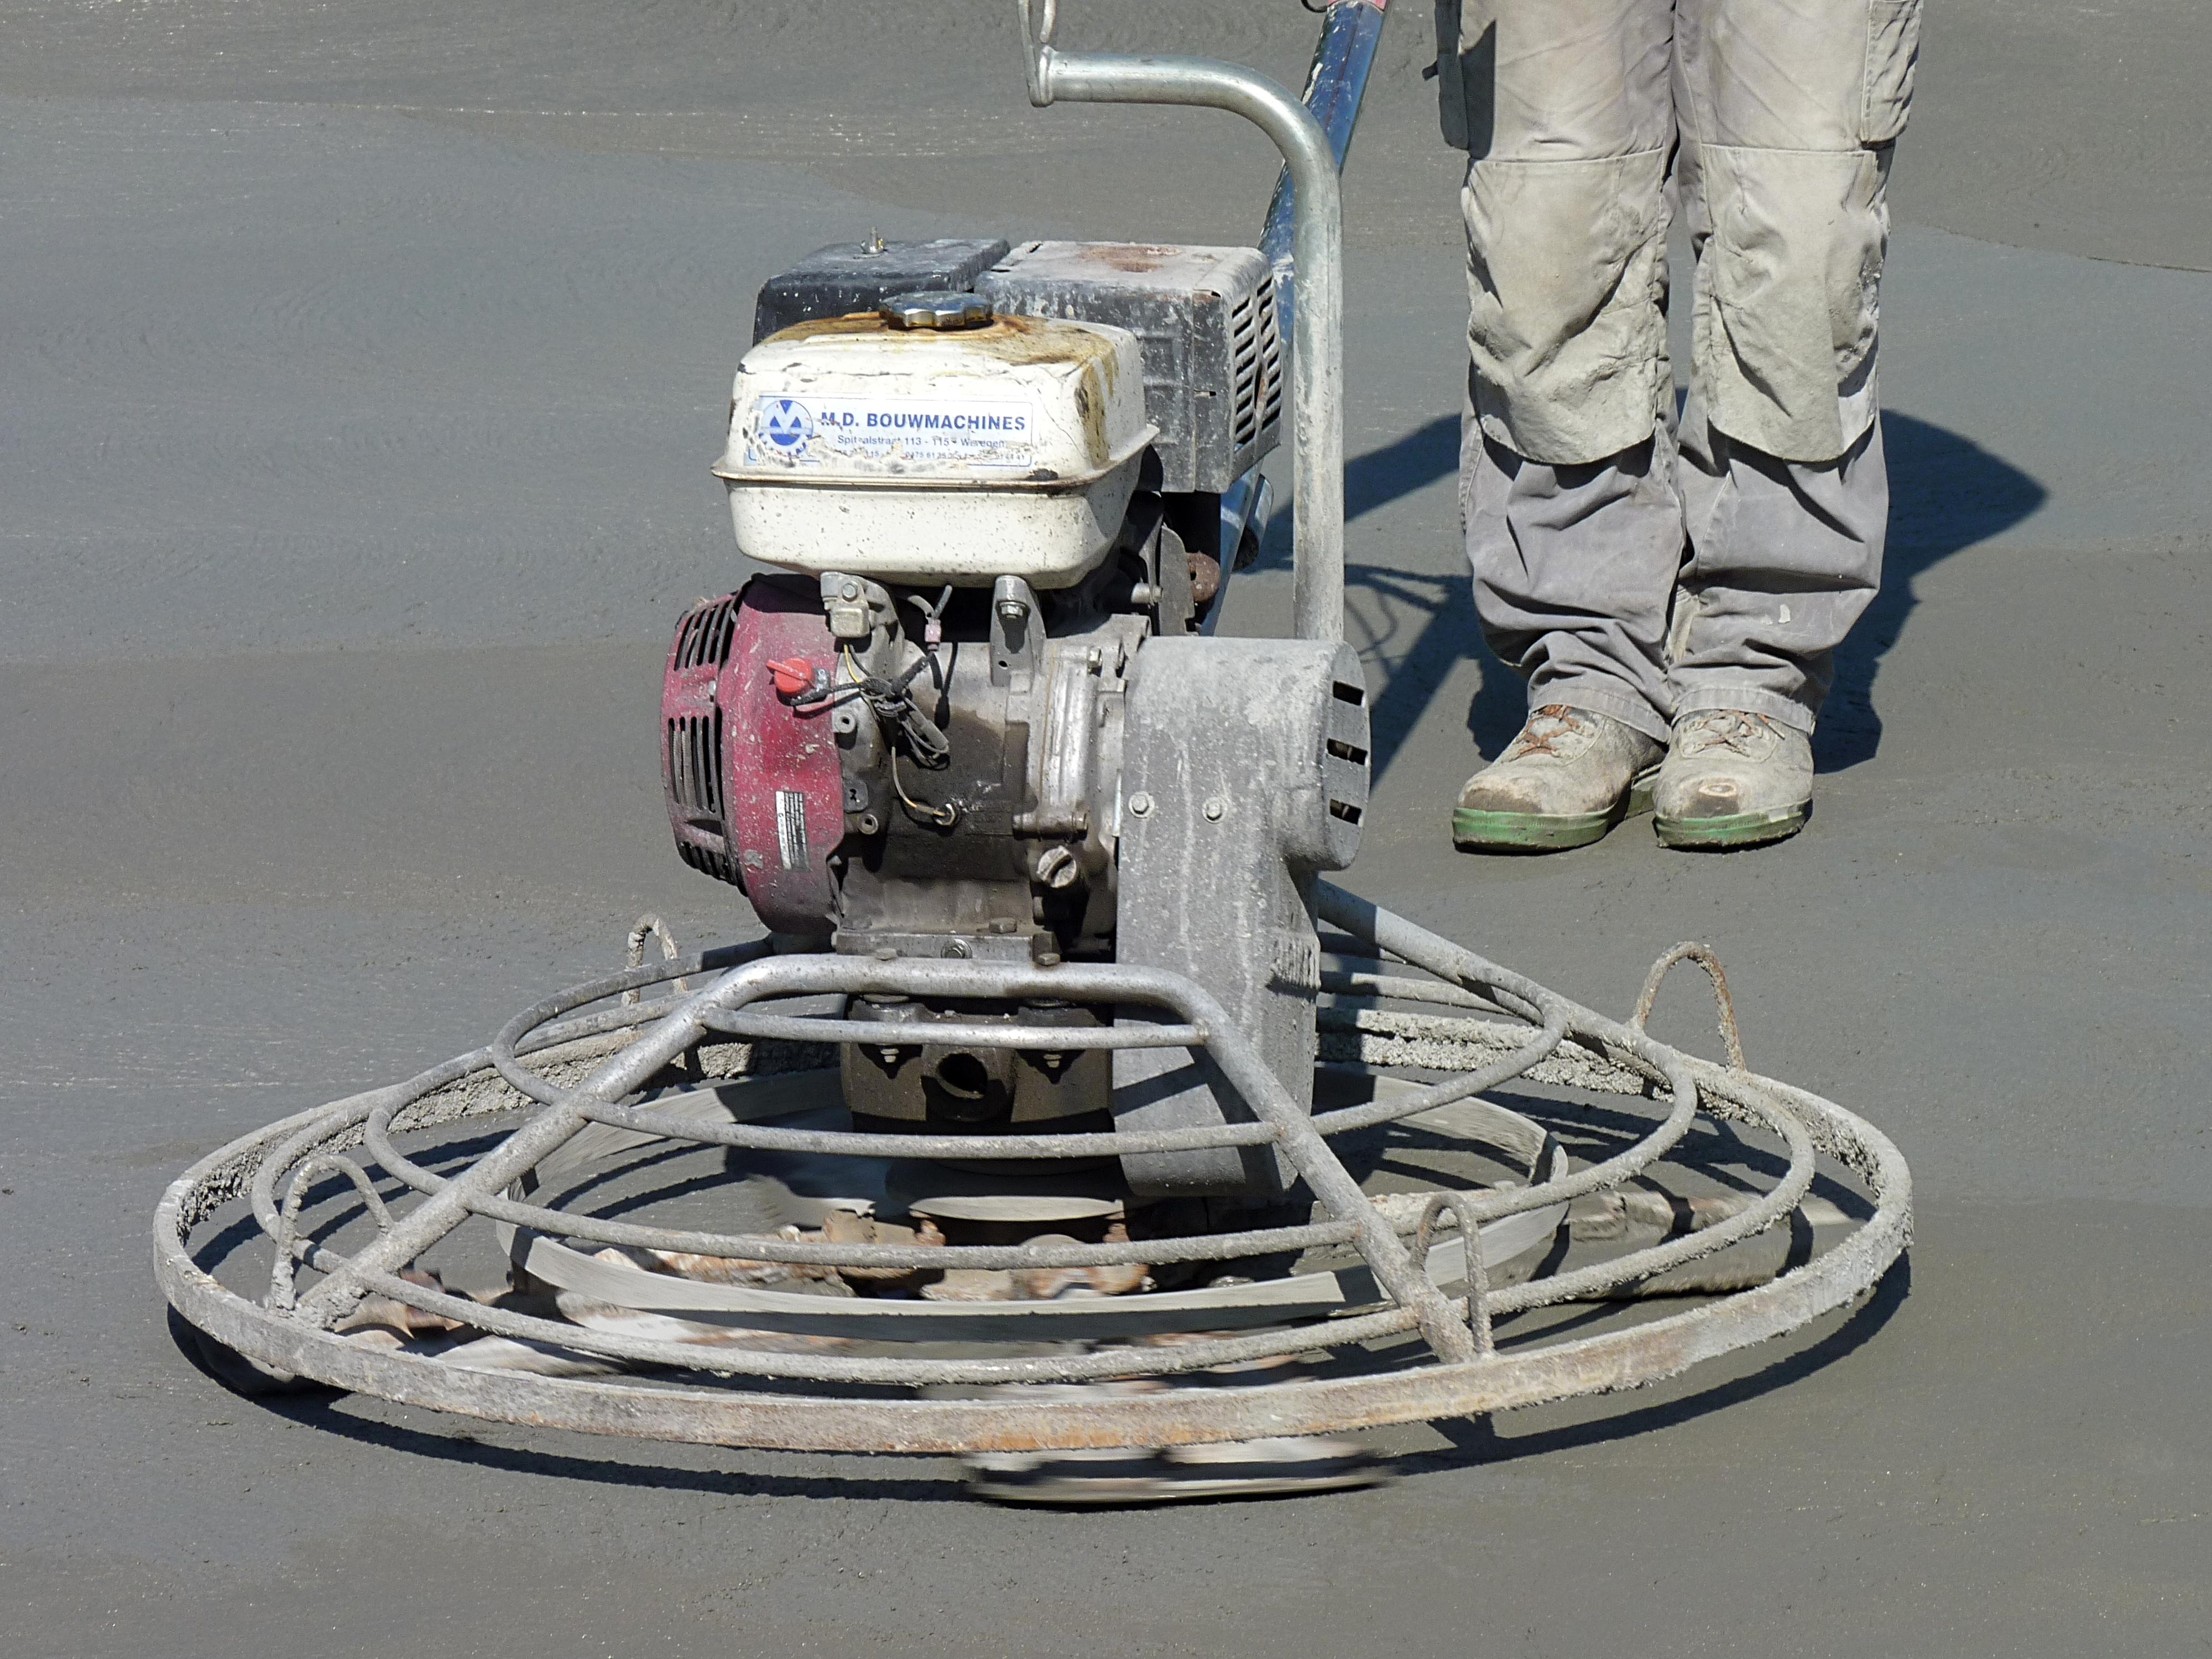 File:Concrete polishing machine J1 JPG - Wikimedia Commons